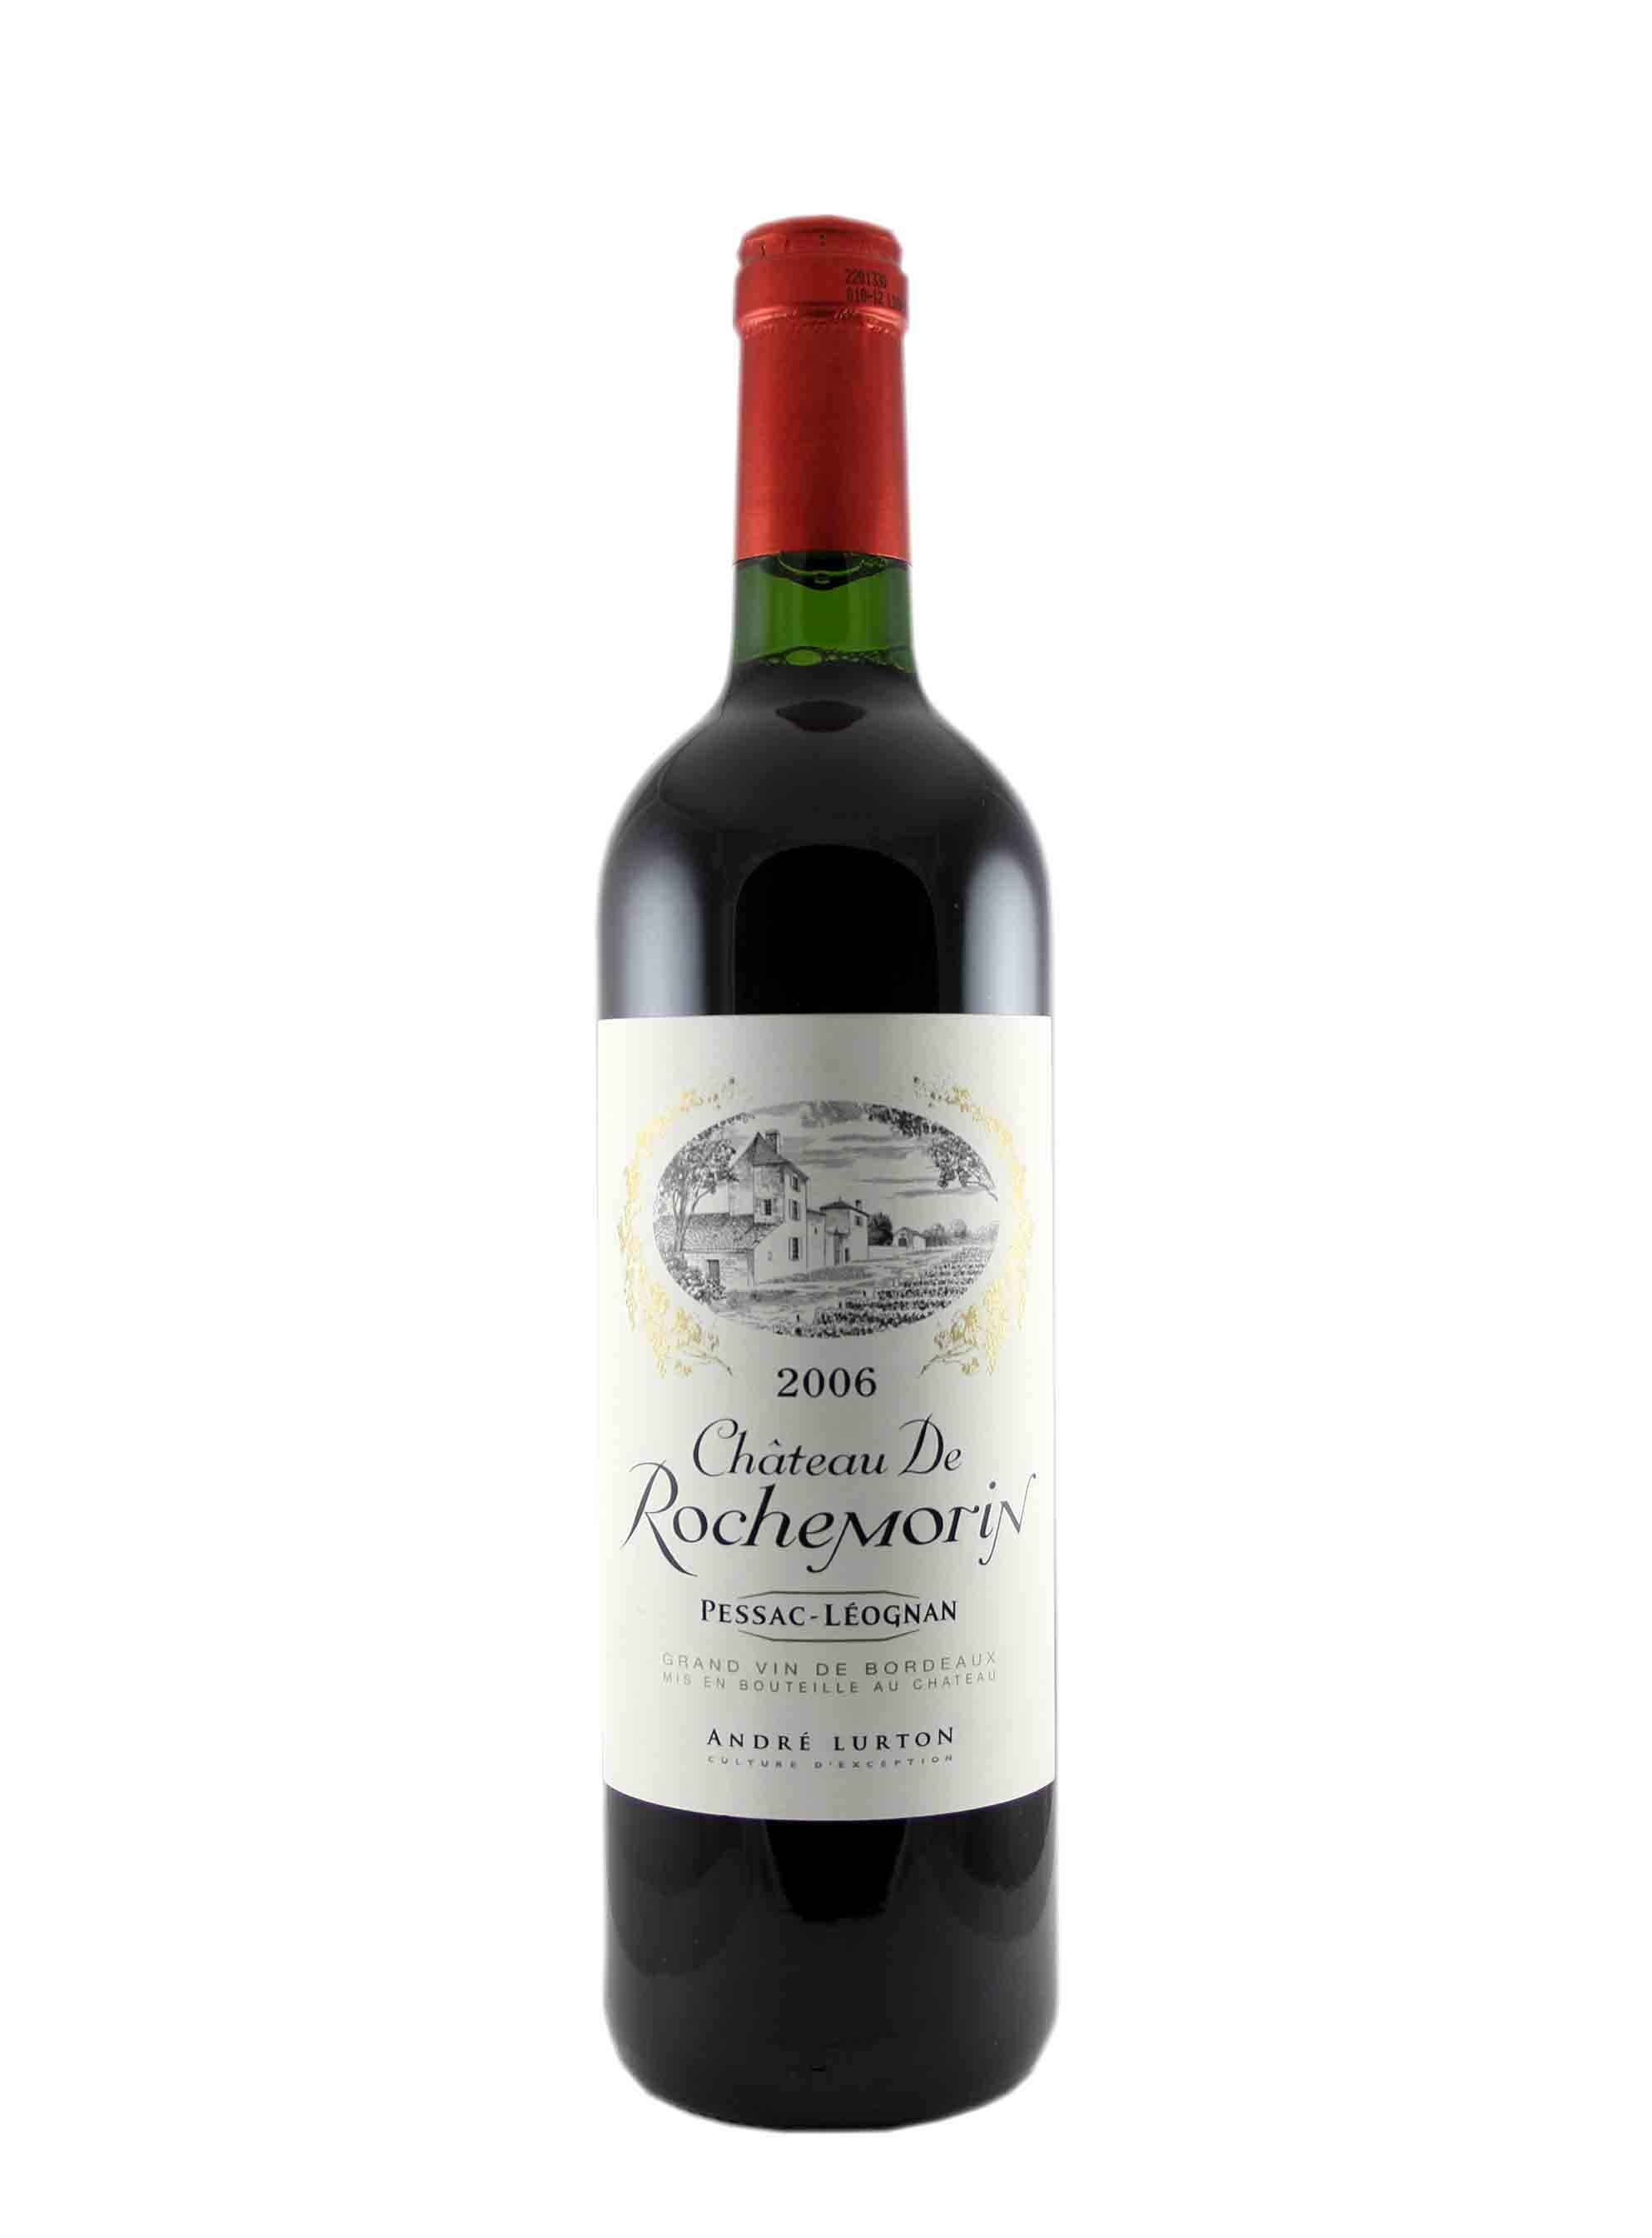 Cuvée, Rochemorin, AOC, 2006, André Lurton, 0.75 l